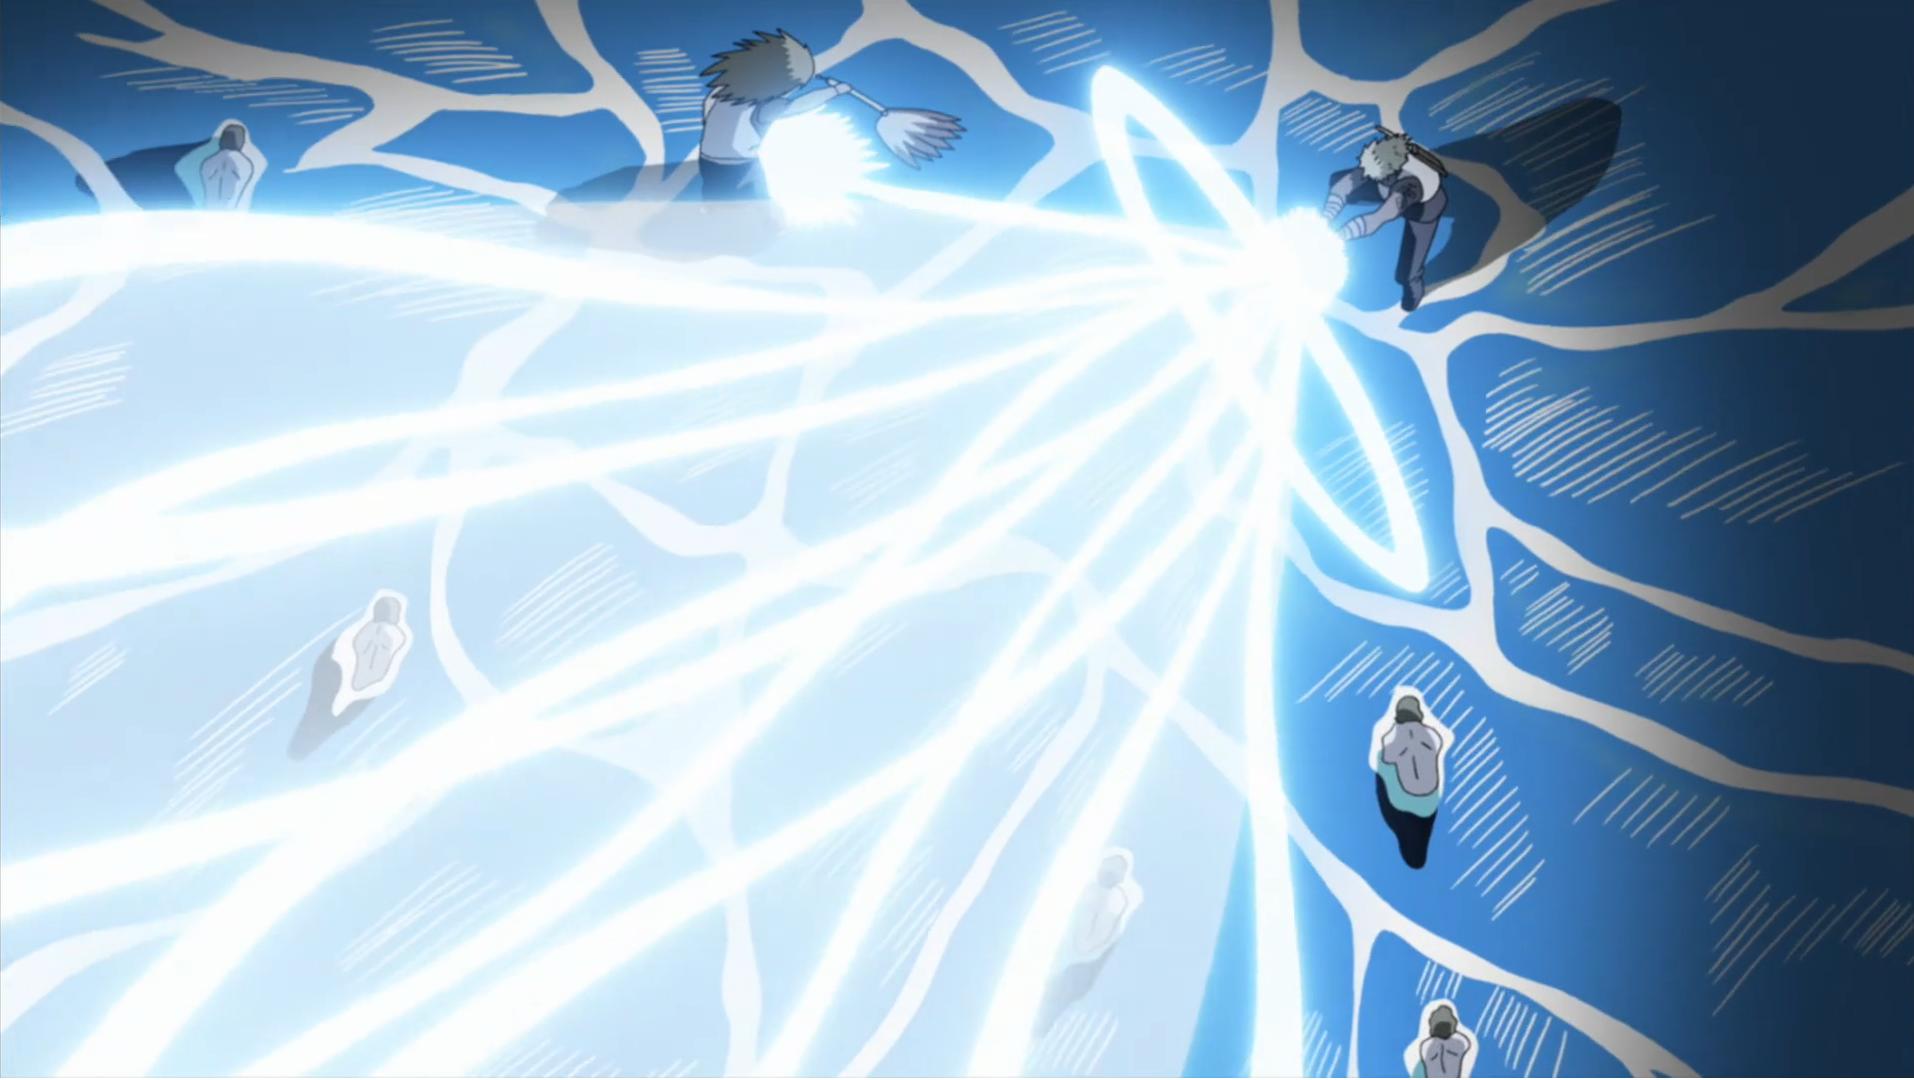 Storm Release | Narutopedia | FANDOM powered by Wikia